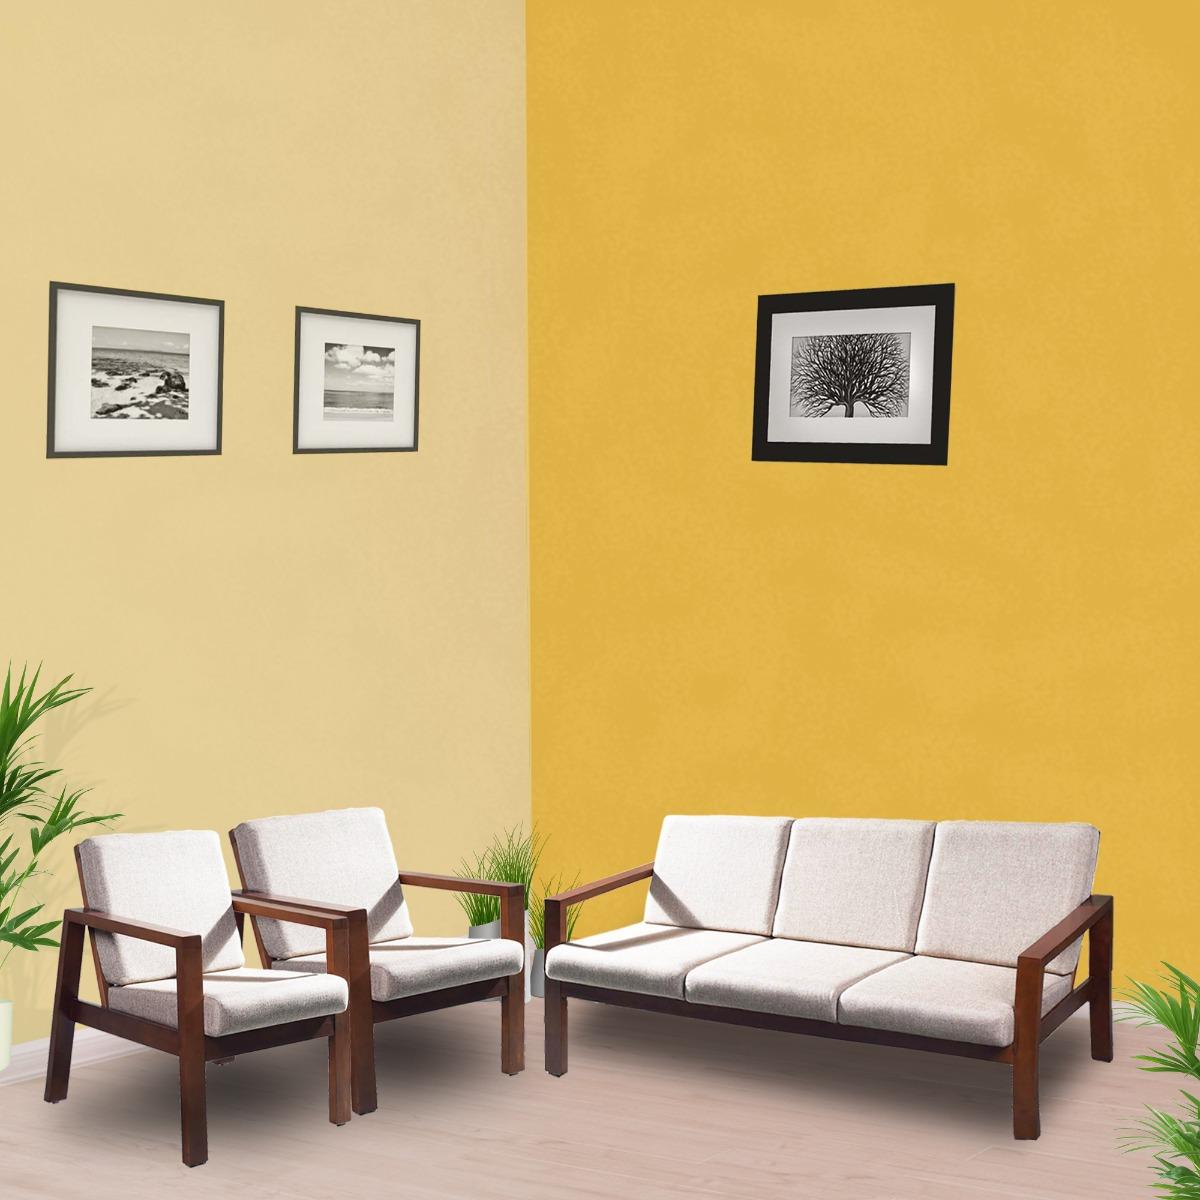 Brilliant Furniture Shops In Kerala Stores In Chennai Jacfurn Machost Co Dining Chair Design Ideas Machostcouk